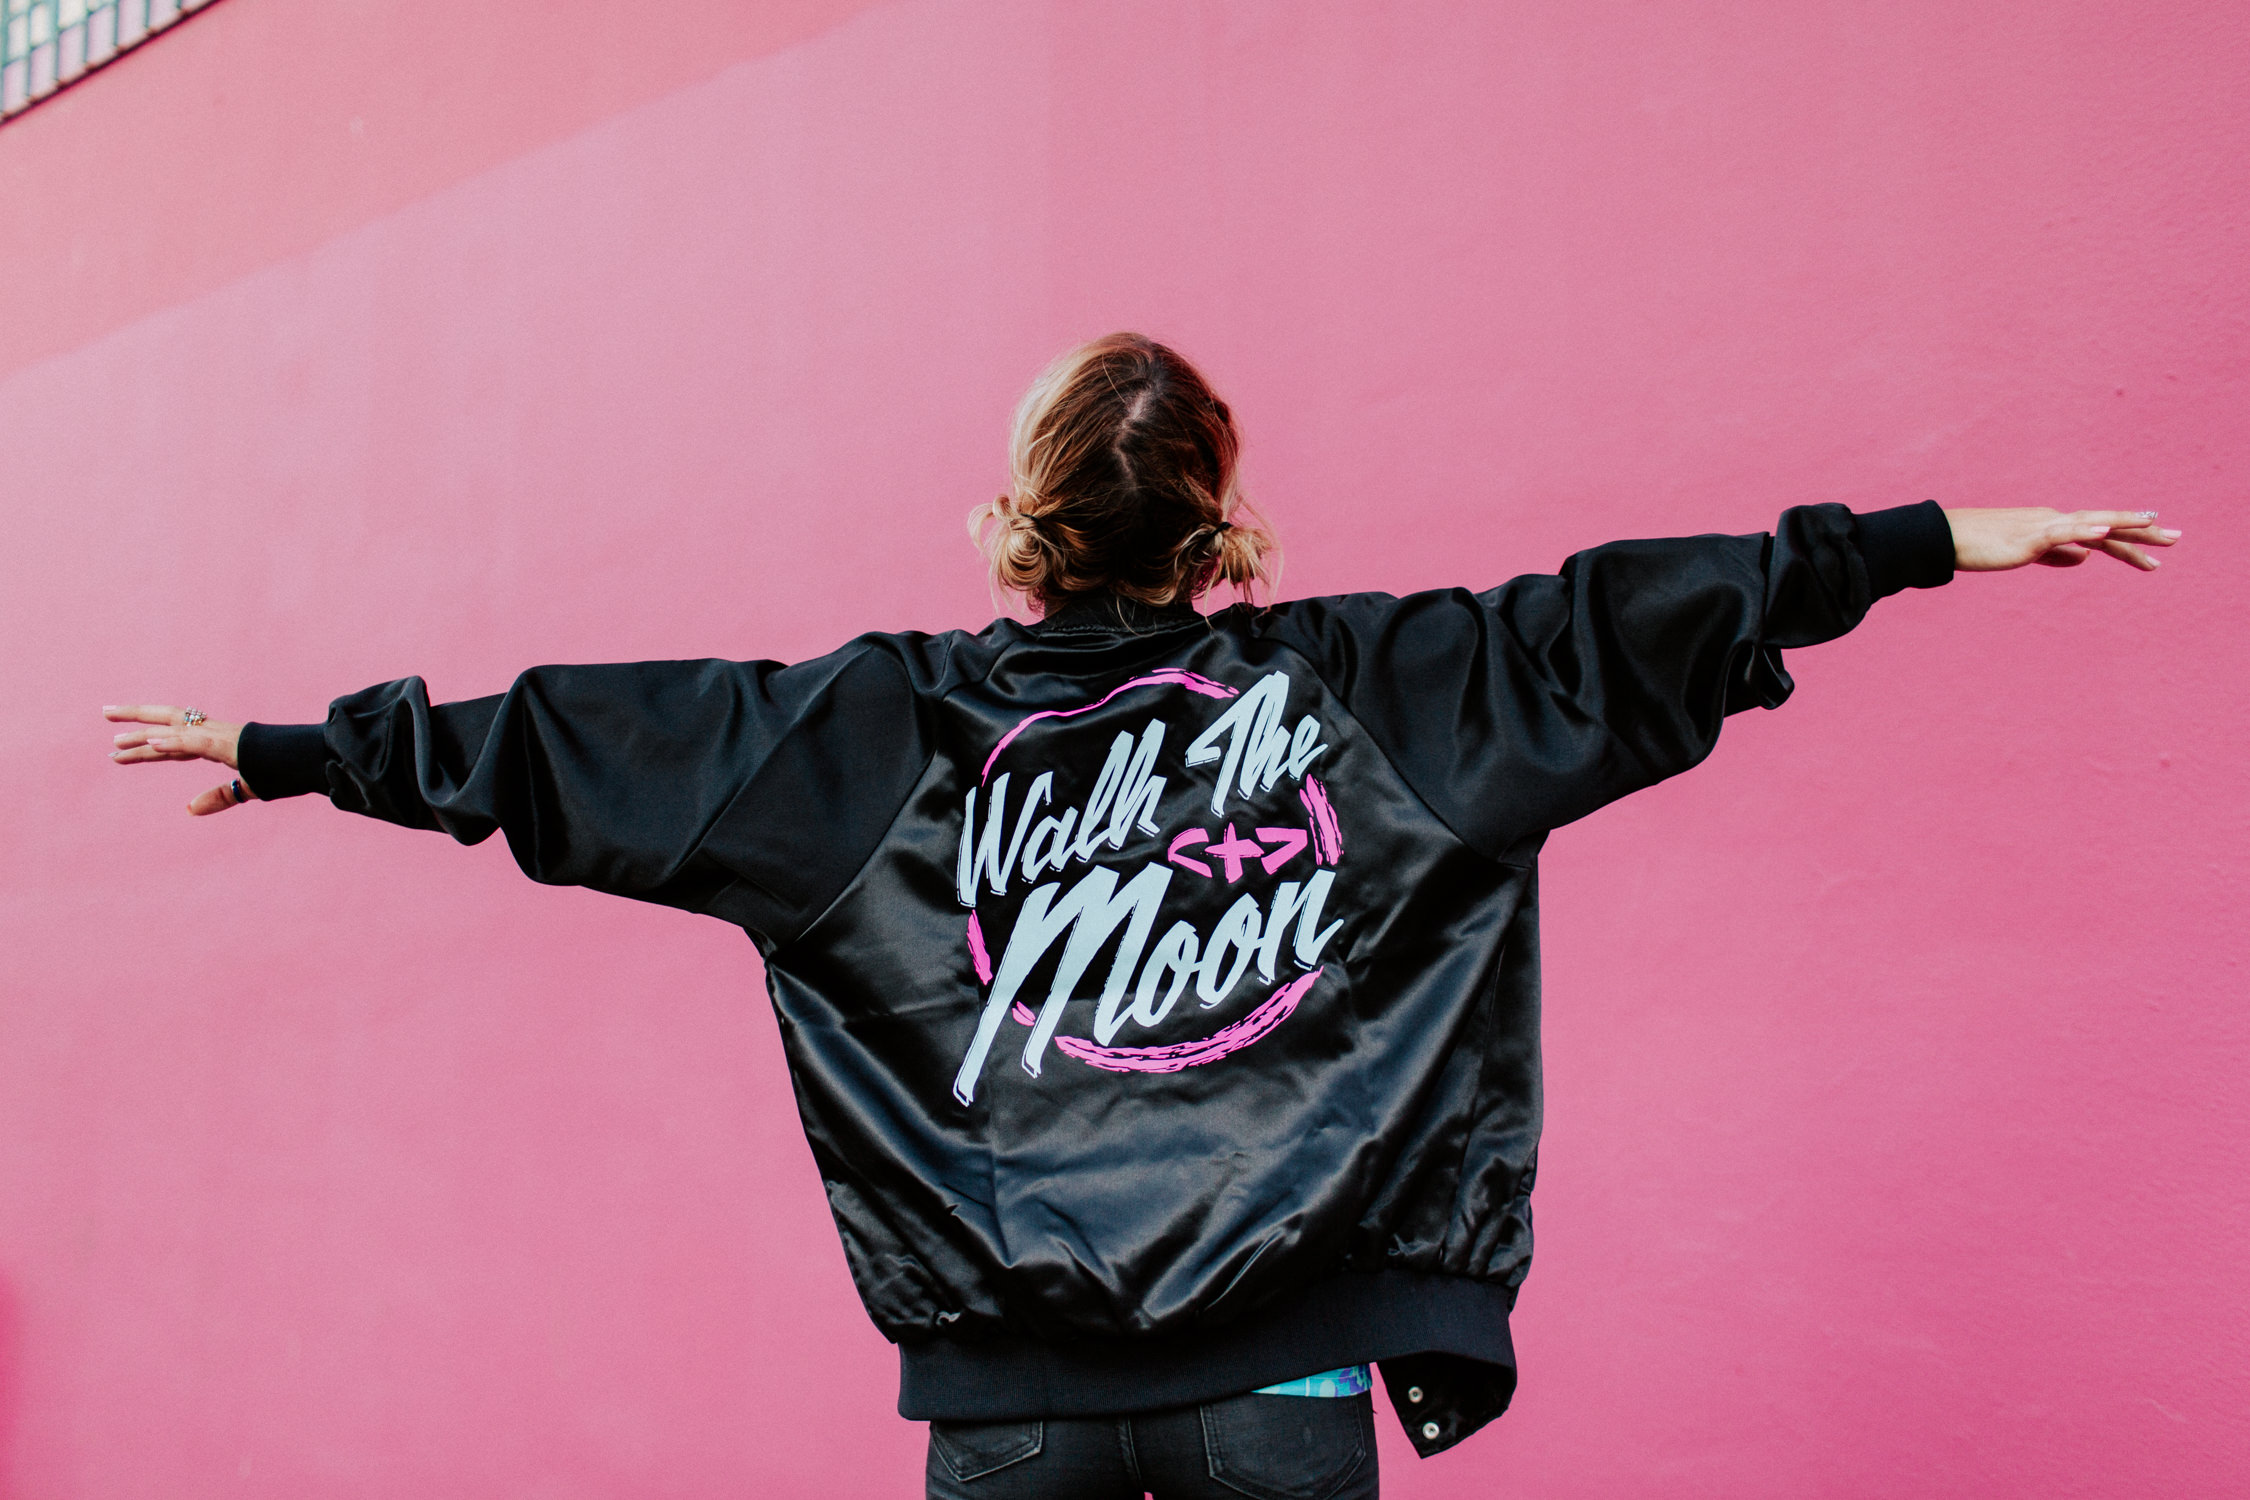 walk-the-moon-merch-bomber-jacket-AnnaLeeMedia